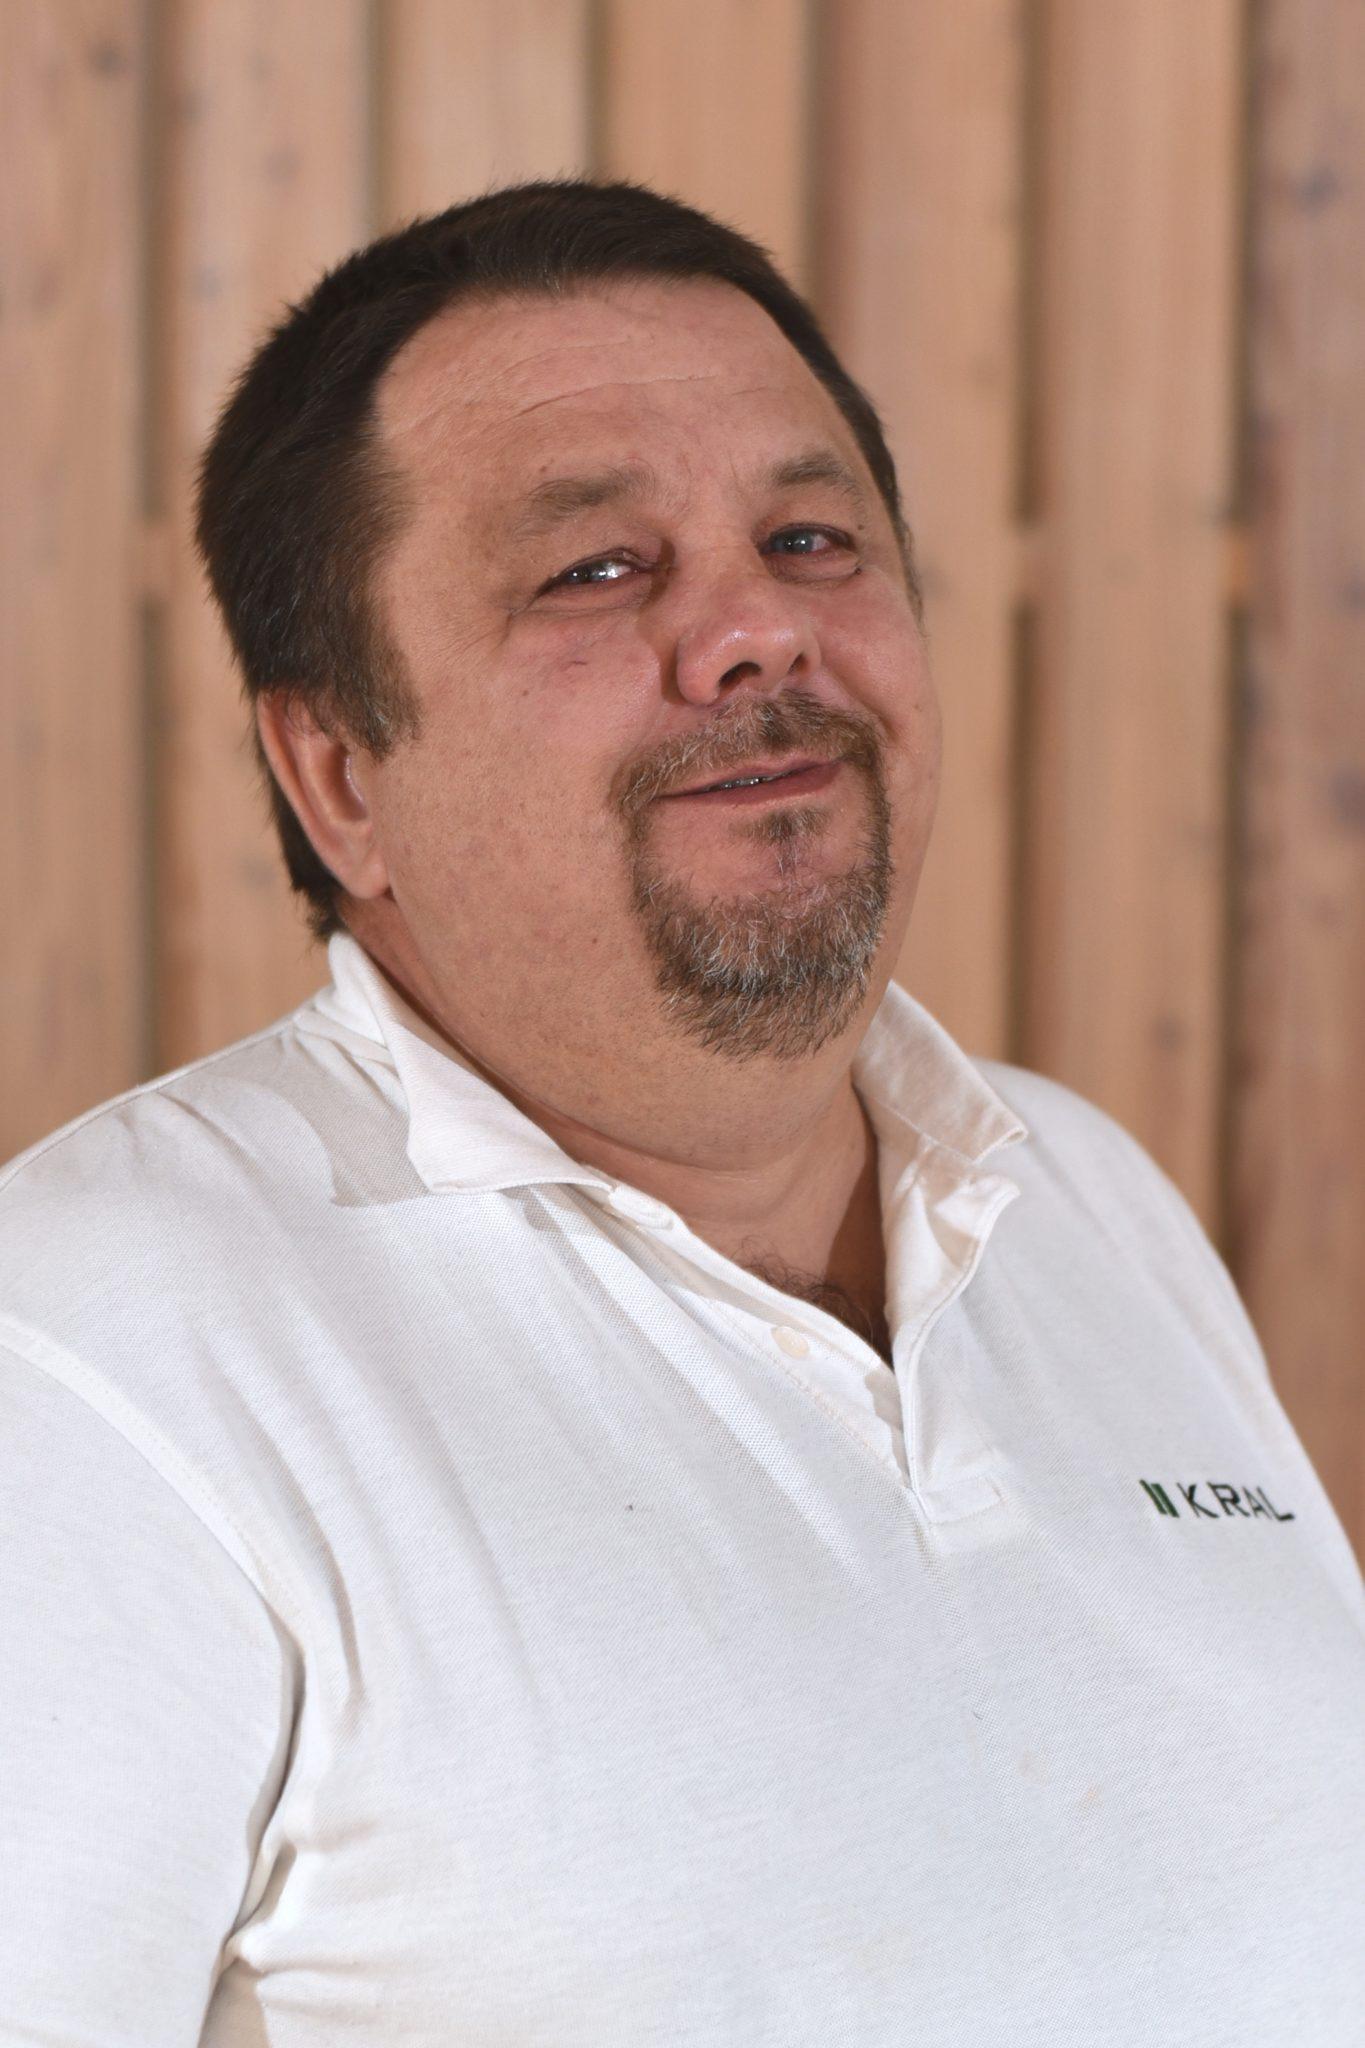 Stanislav Pekný